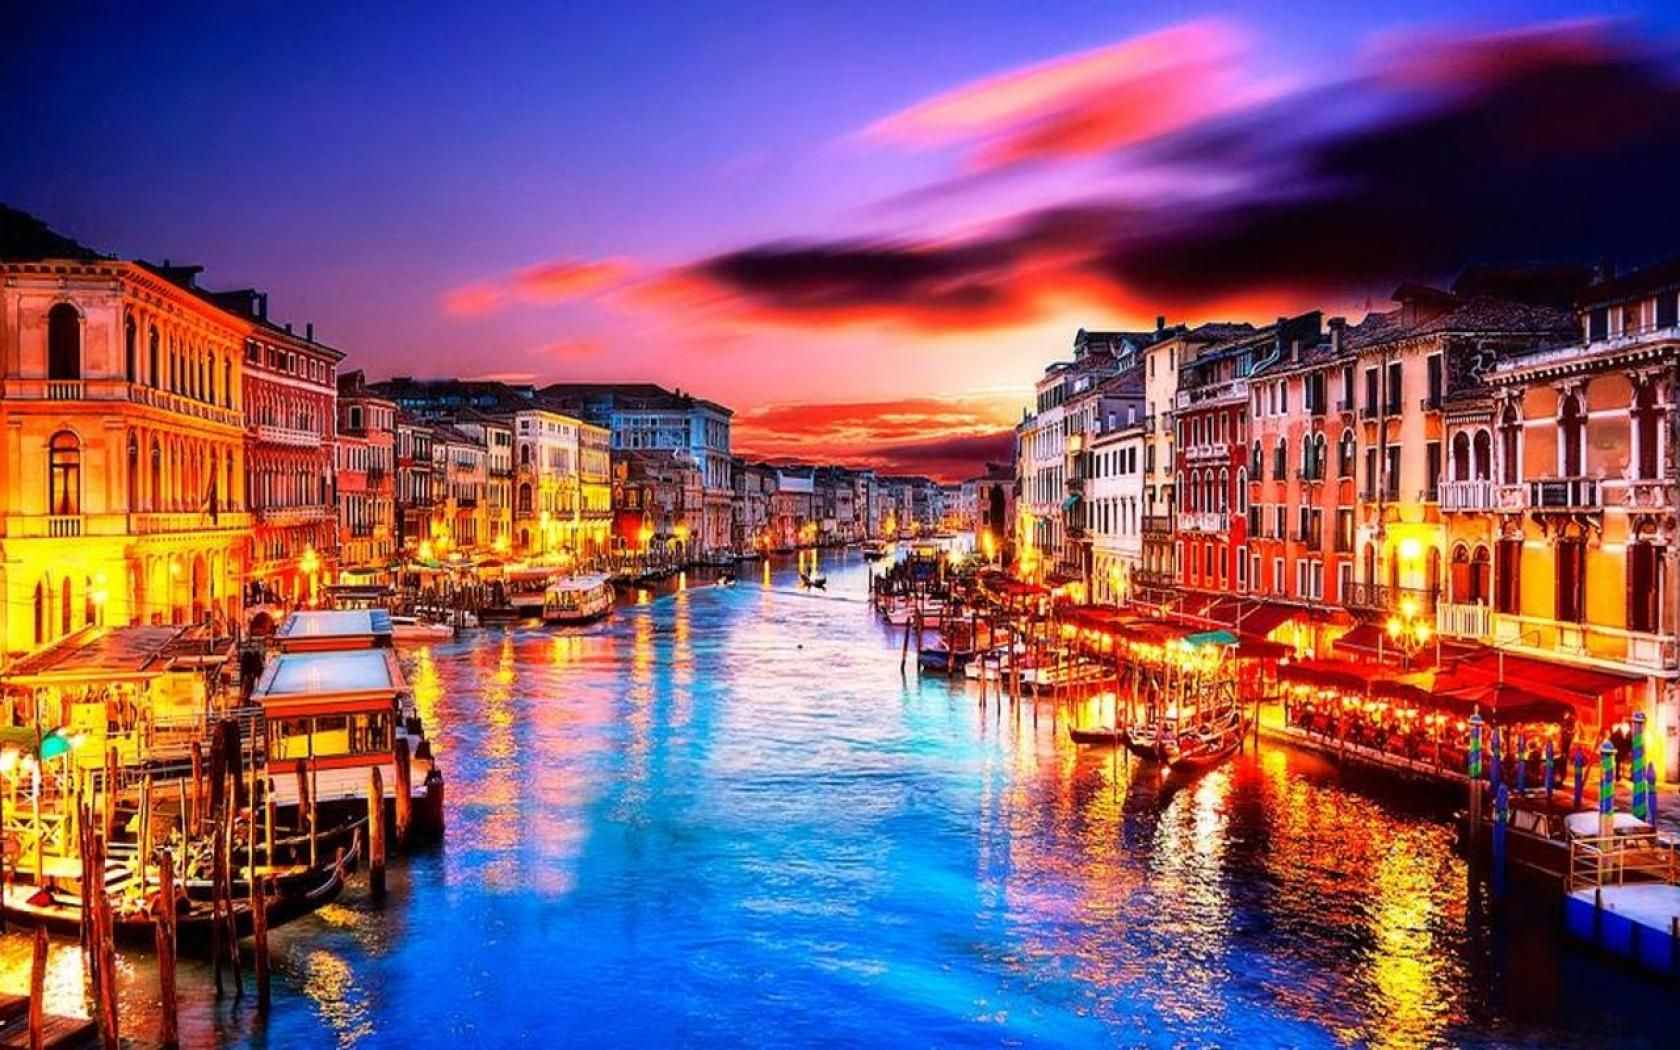 Venice Italy at Night Romantic Venice At Night   wallpaper 1680x1050